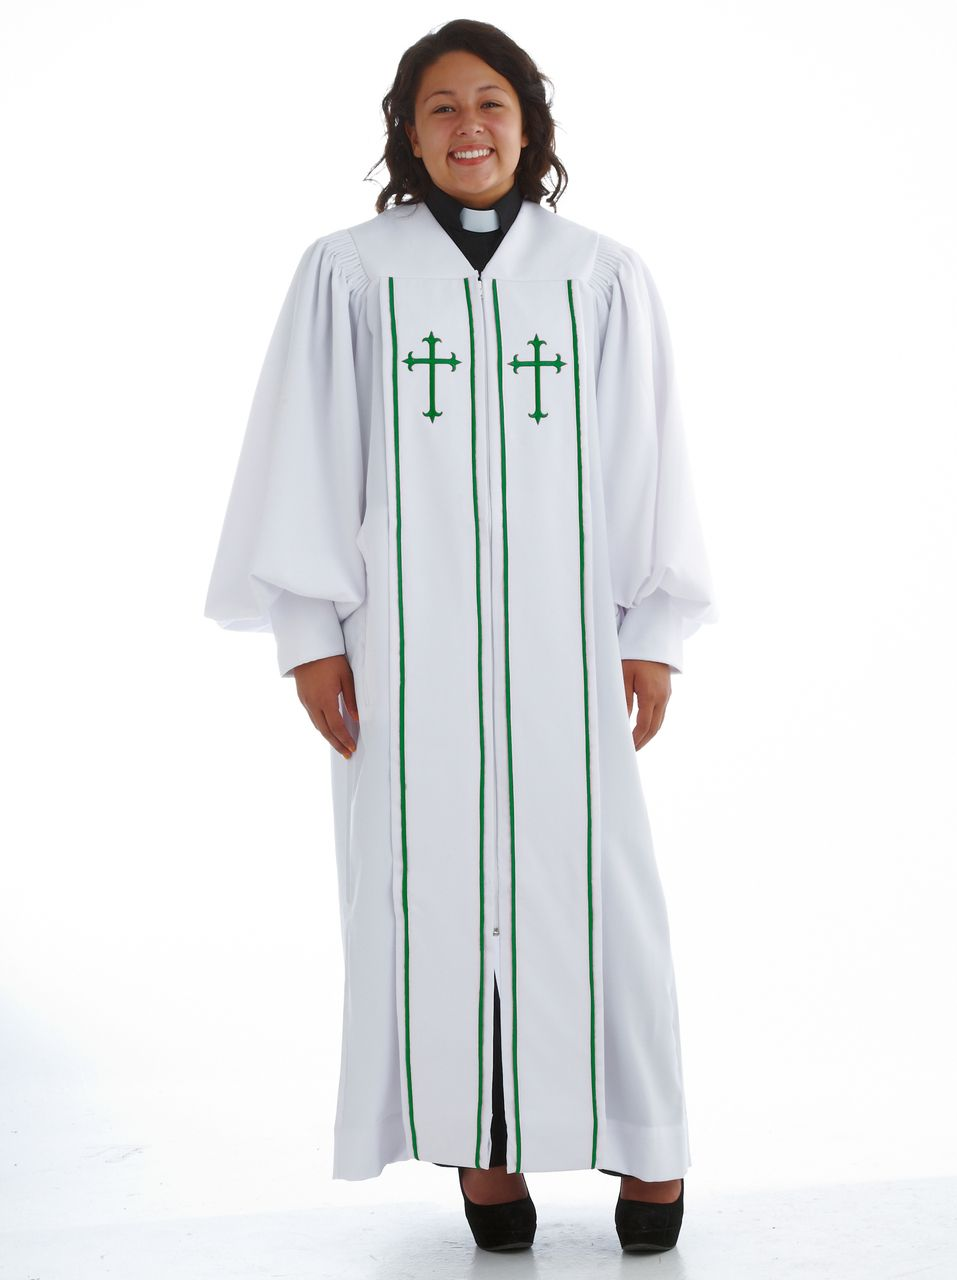 928 P. Men's & Women's Clergy Robe - White/Emerald